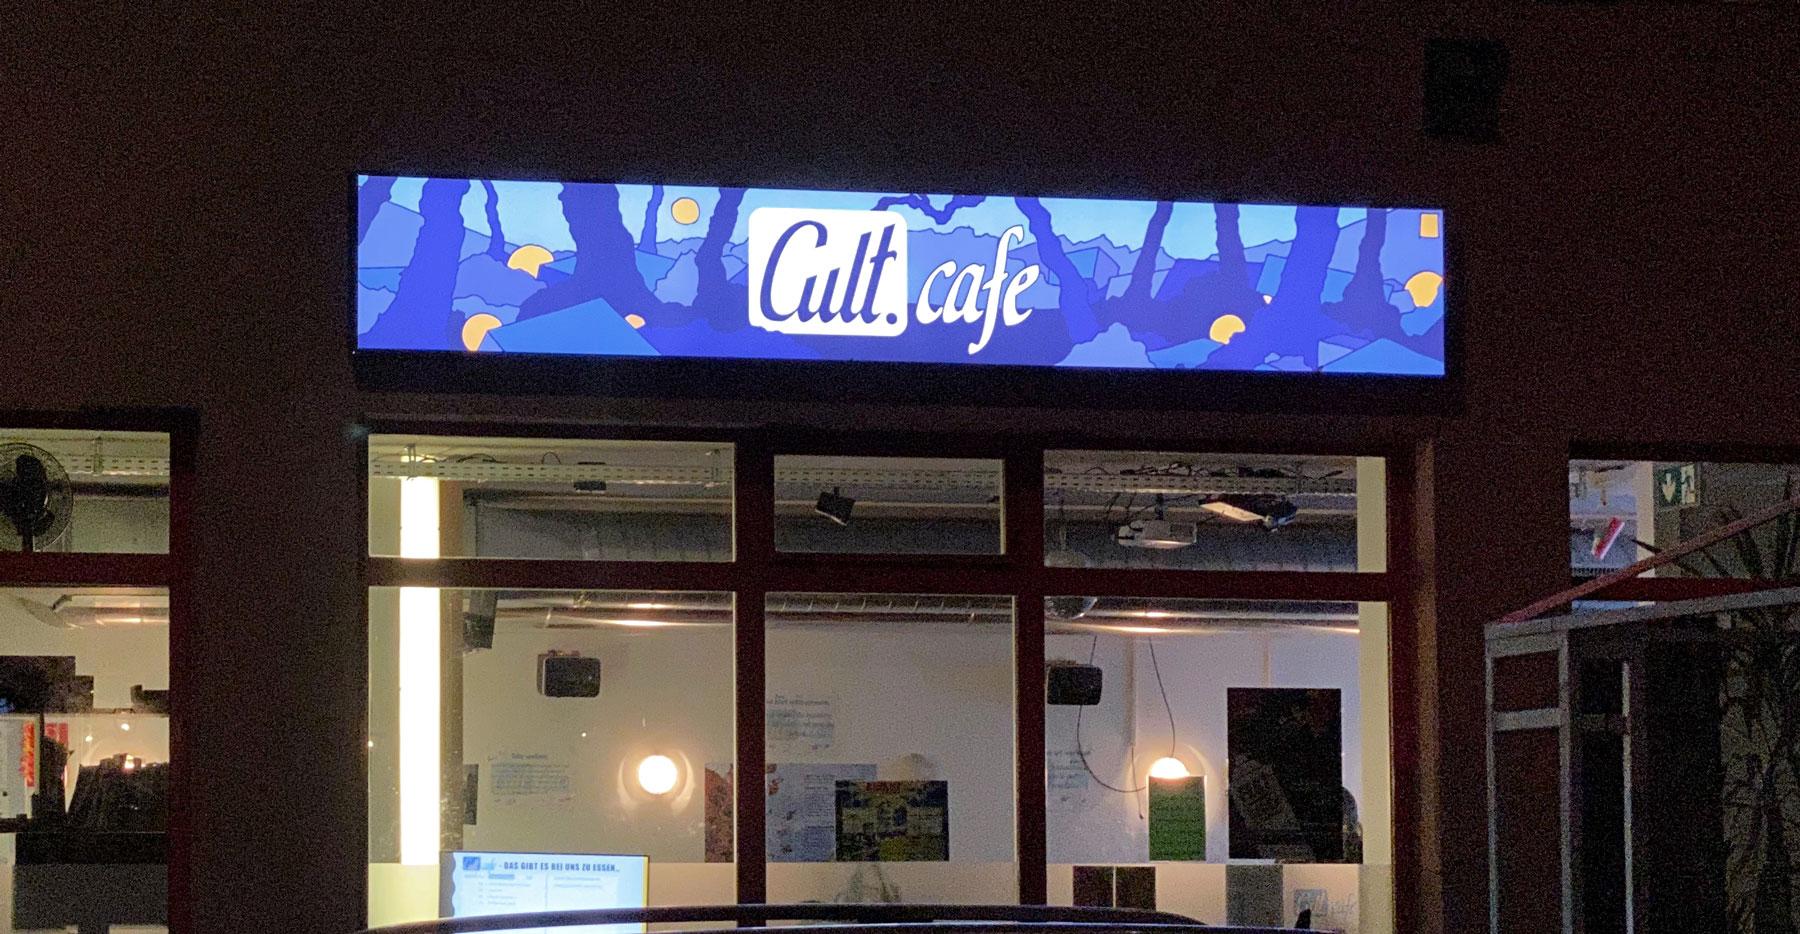 Cult.cafe